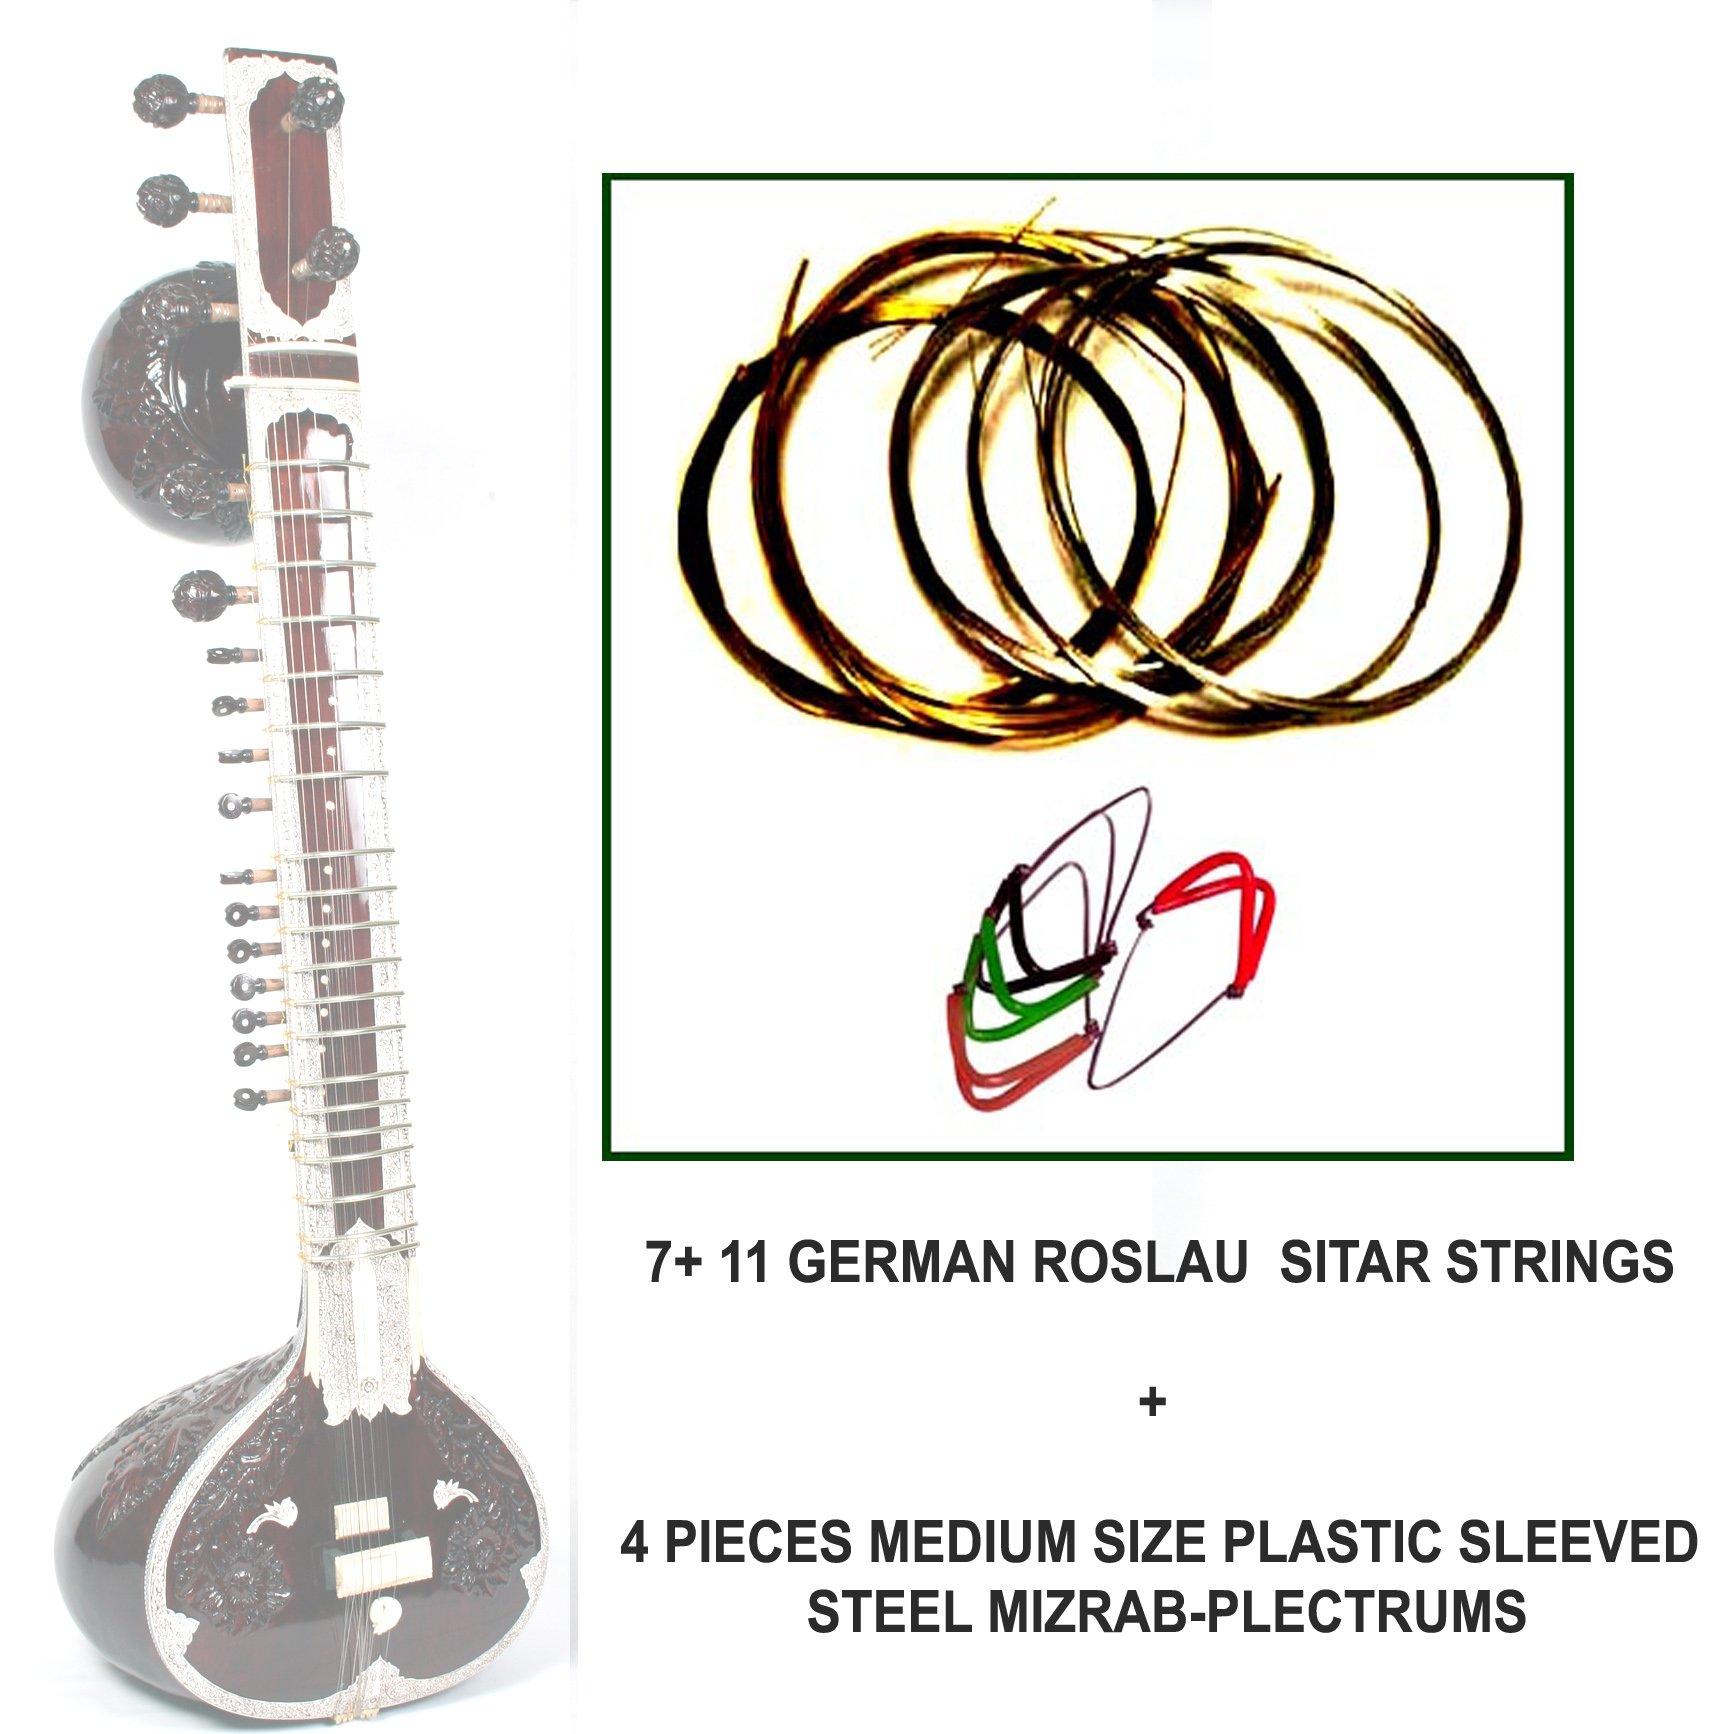 Pluctrum for Indian Sitar Pick Set of 4 Mizrab high quality mizrab